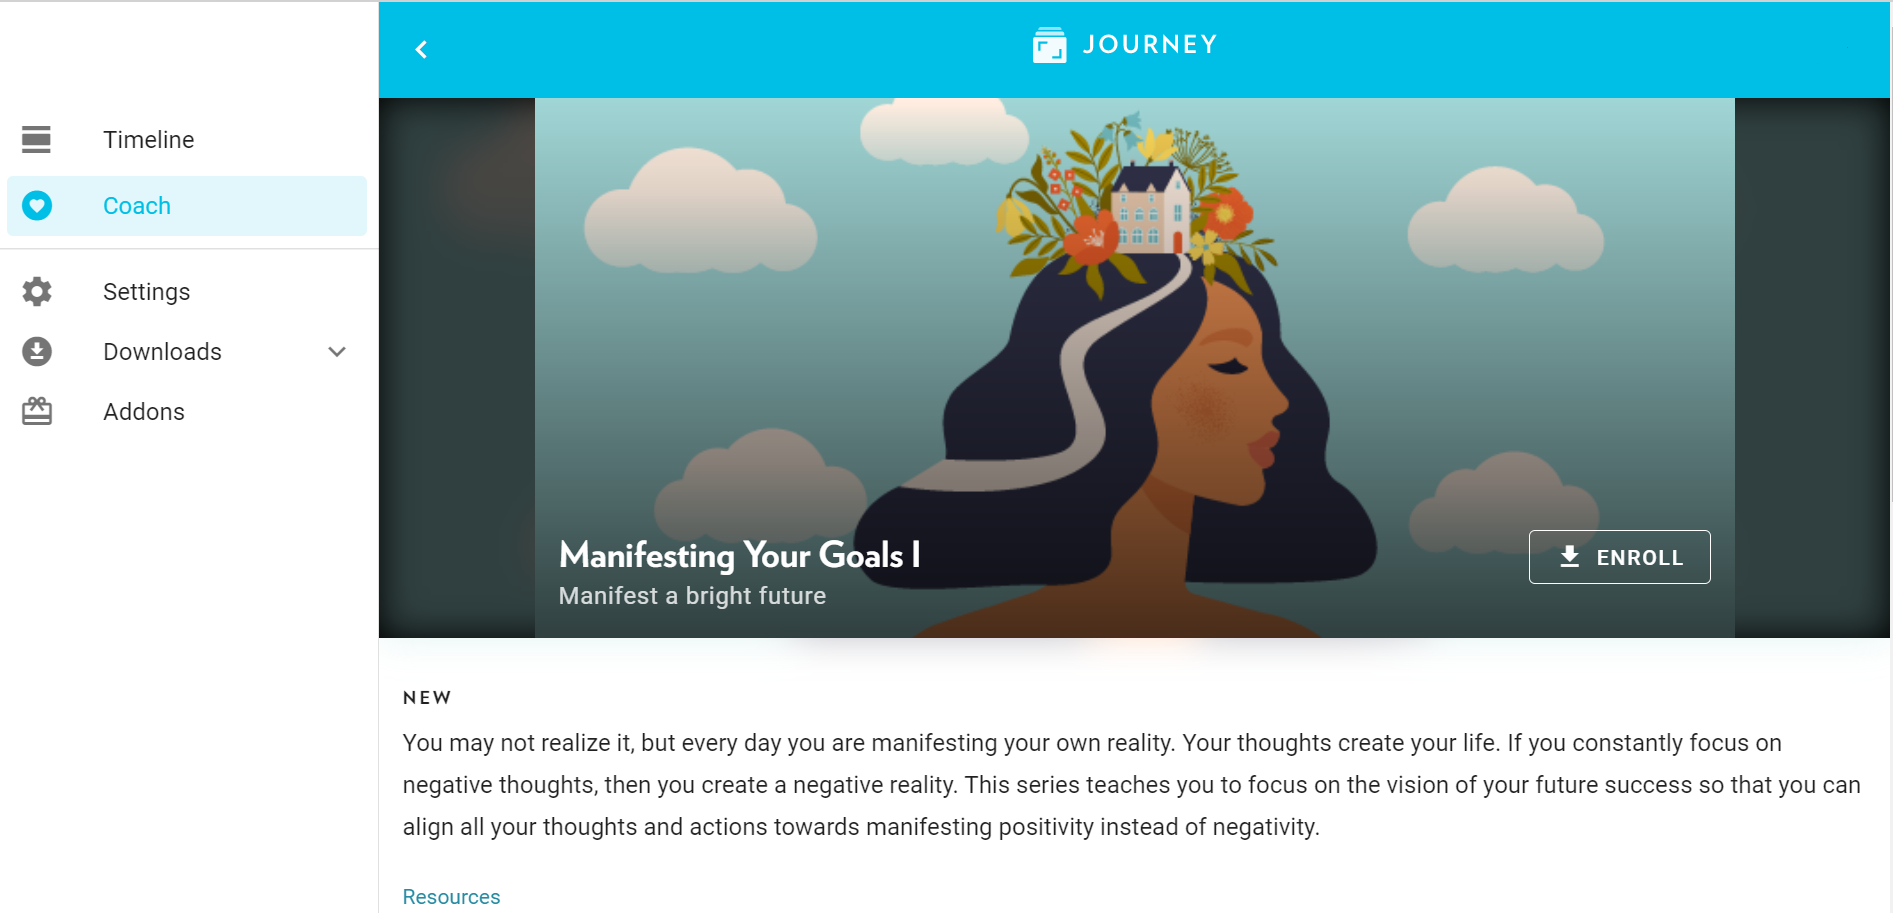 Journey's new Coach Program on manifesting your goals